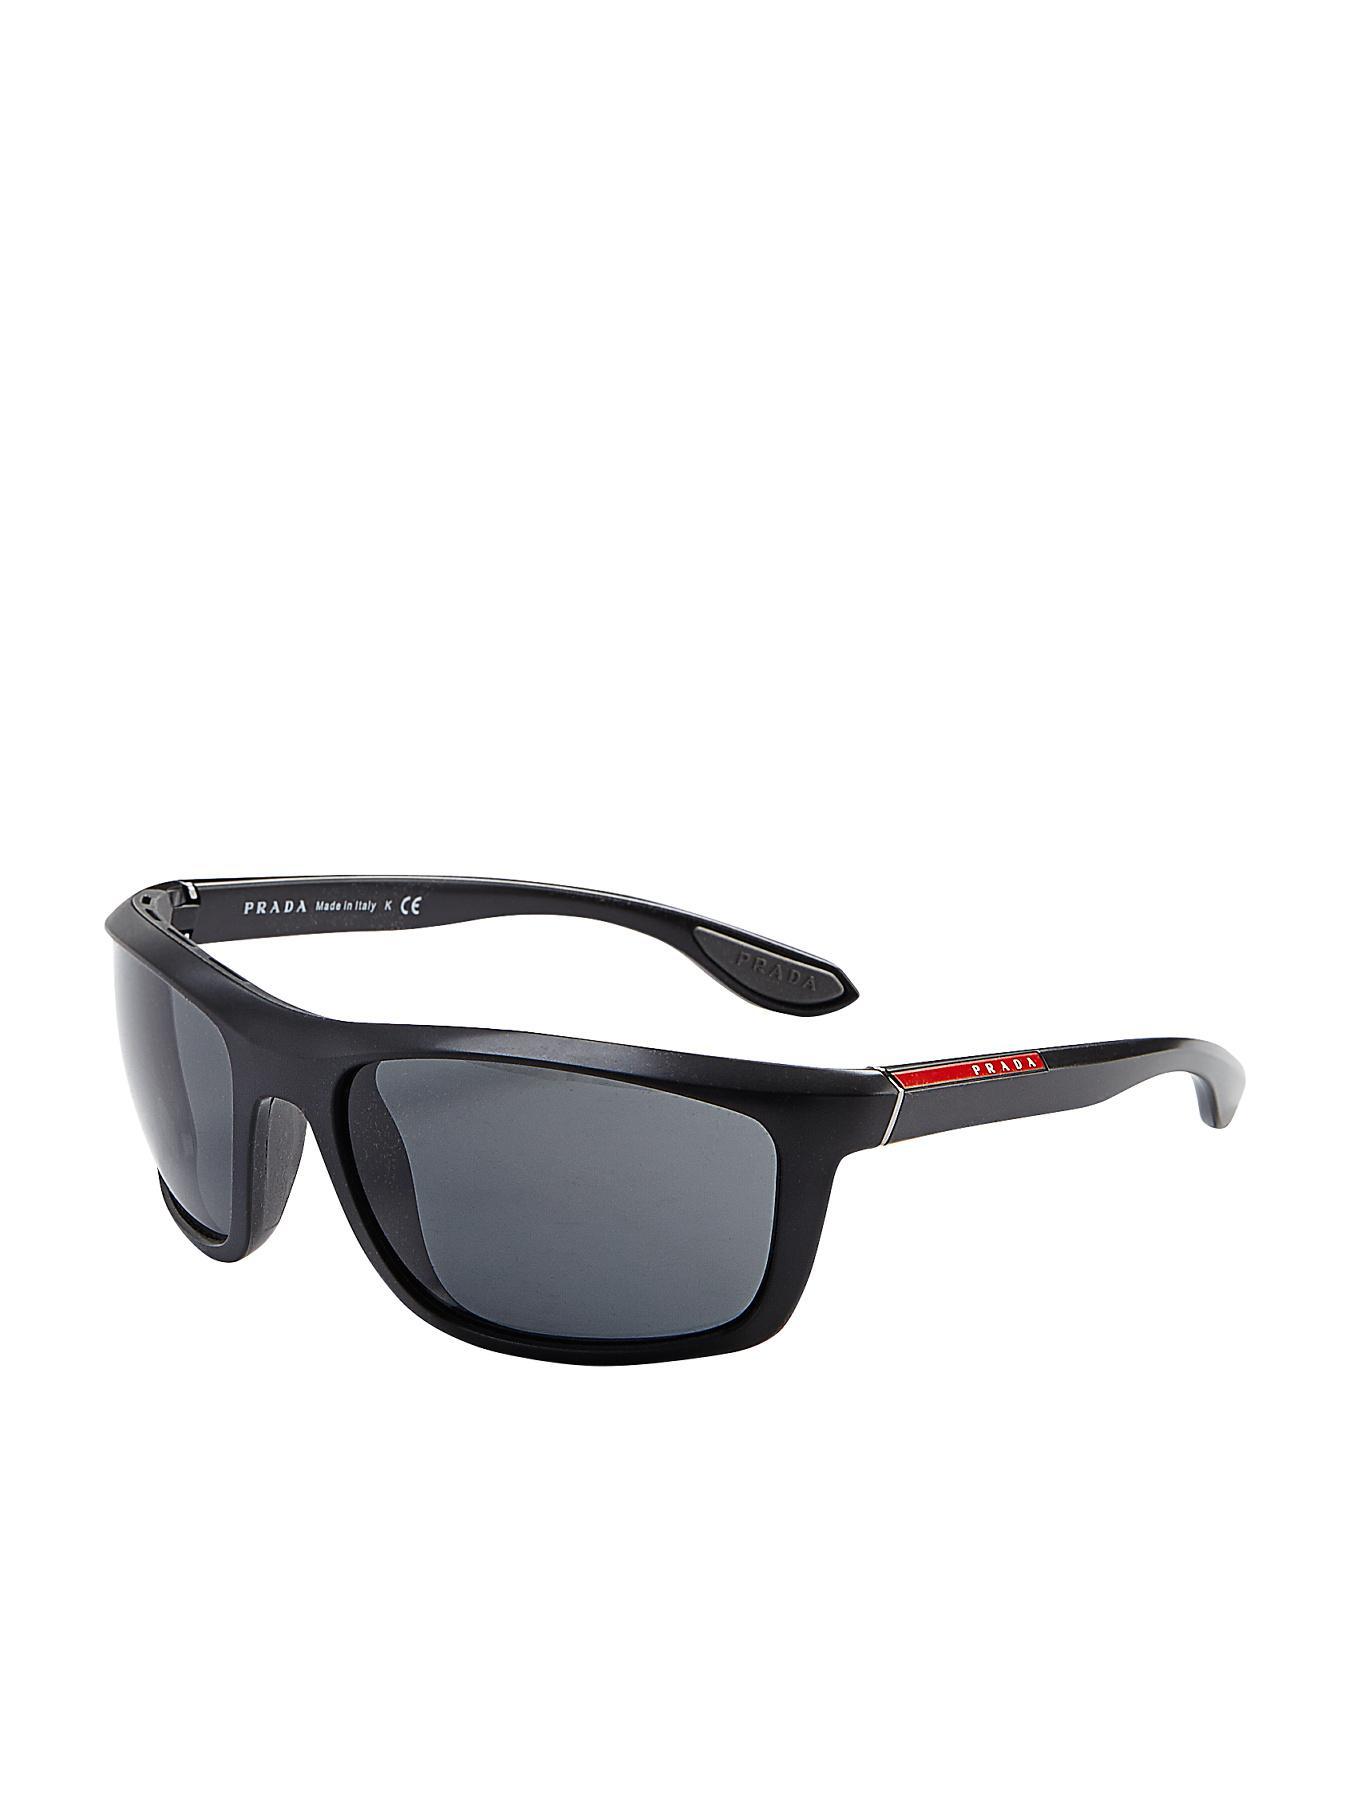 Prada Sport Wraparound Sunglasses - Black - Black, Black